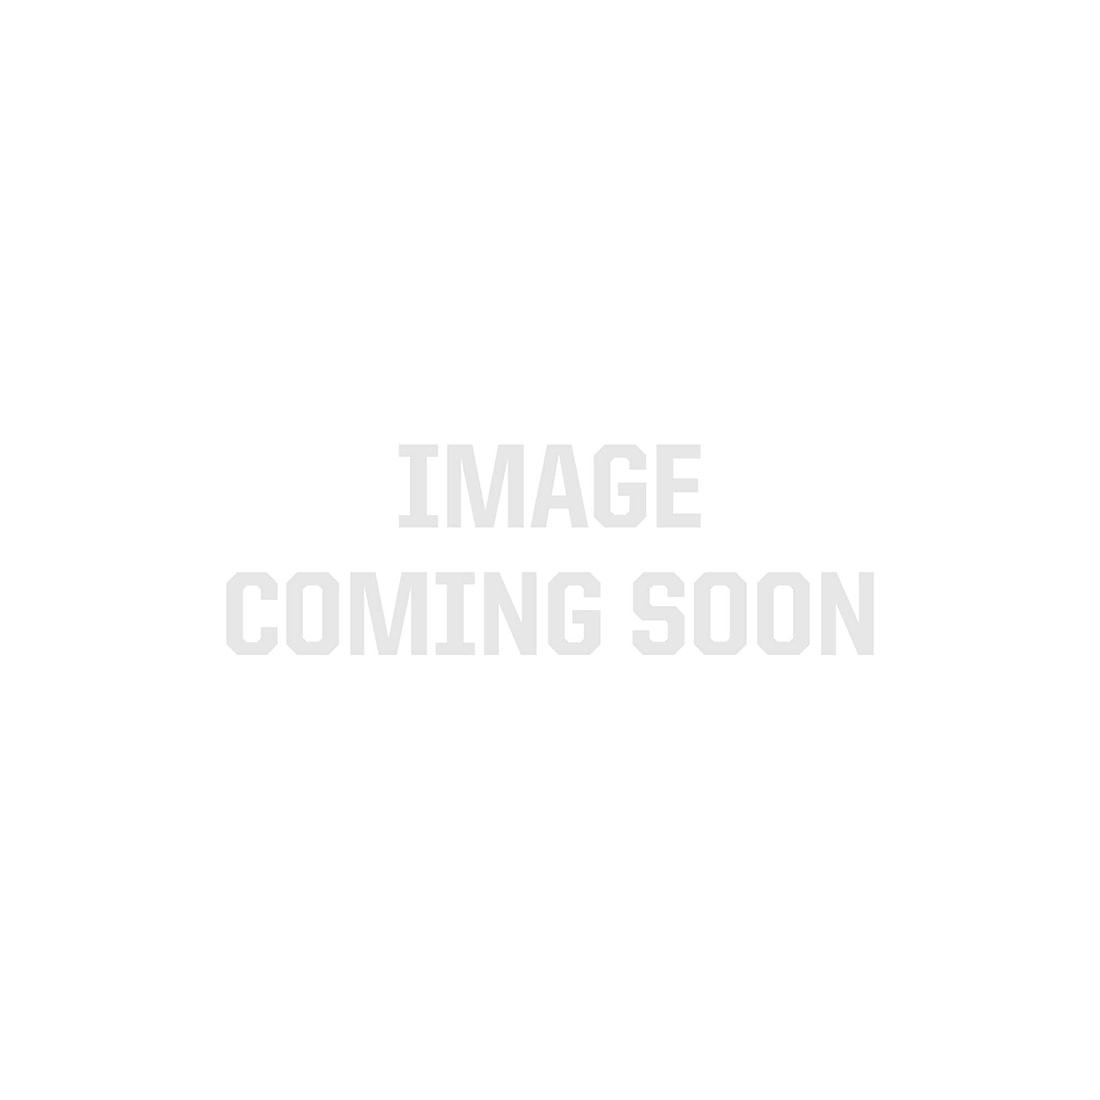 Leviton 15 Amp, 125 Volt, NEMA 5-15P Plug